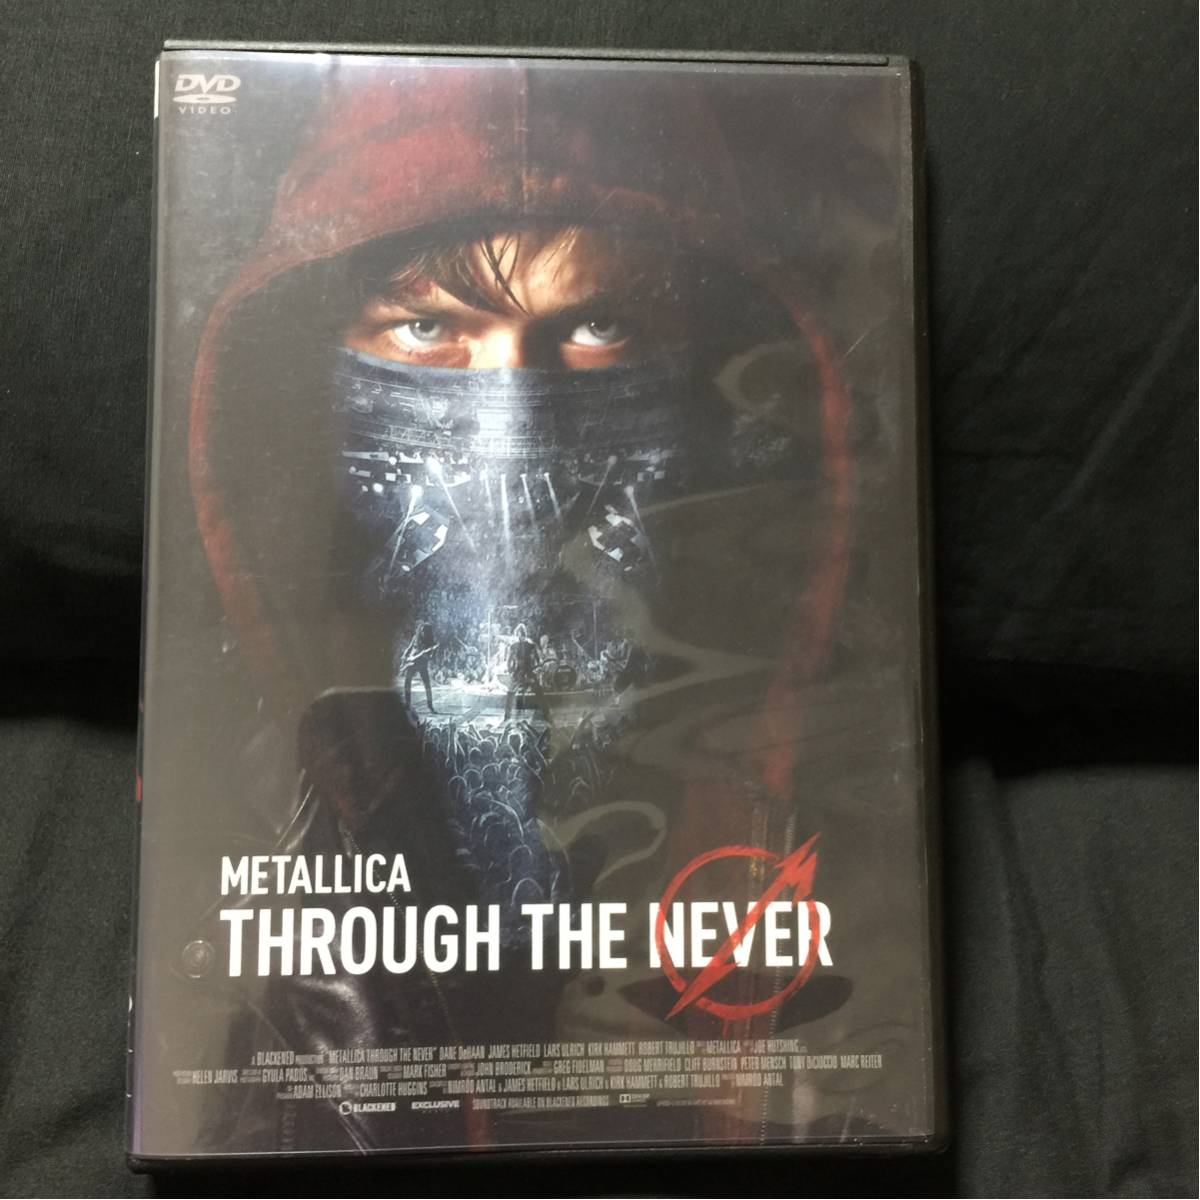 METALLICA THROUGH THE NEVER DVD メタリカ ライブグッズの画像